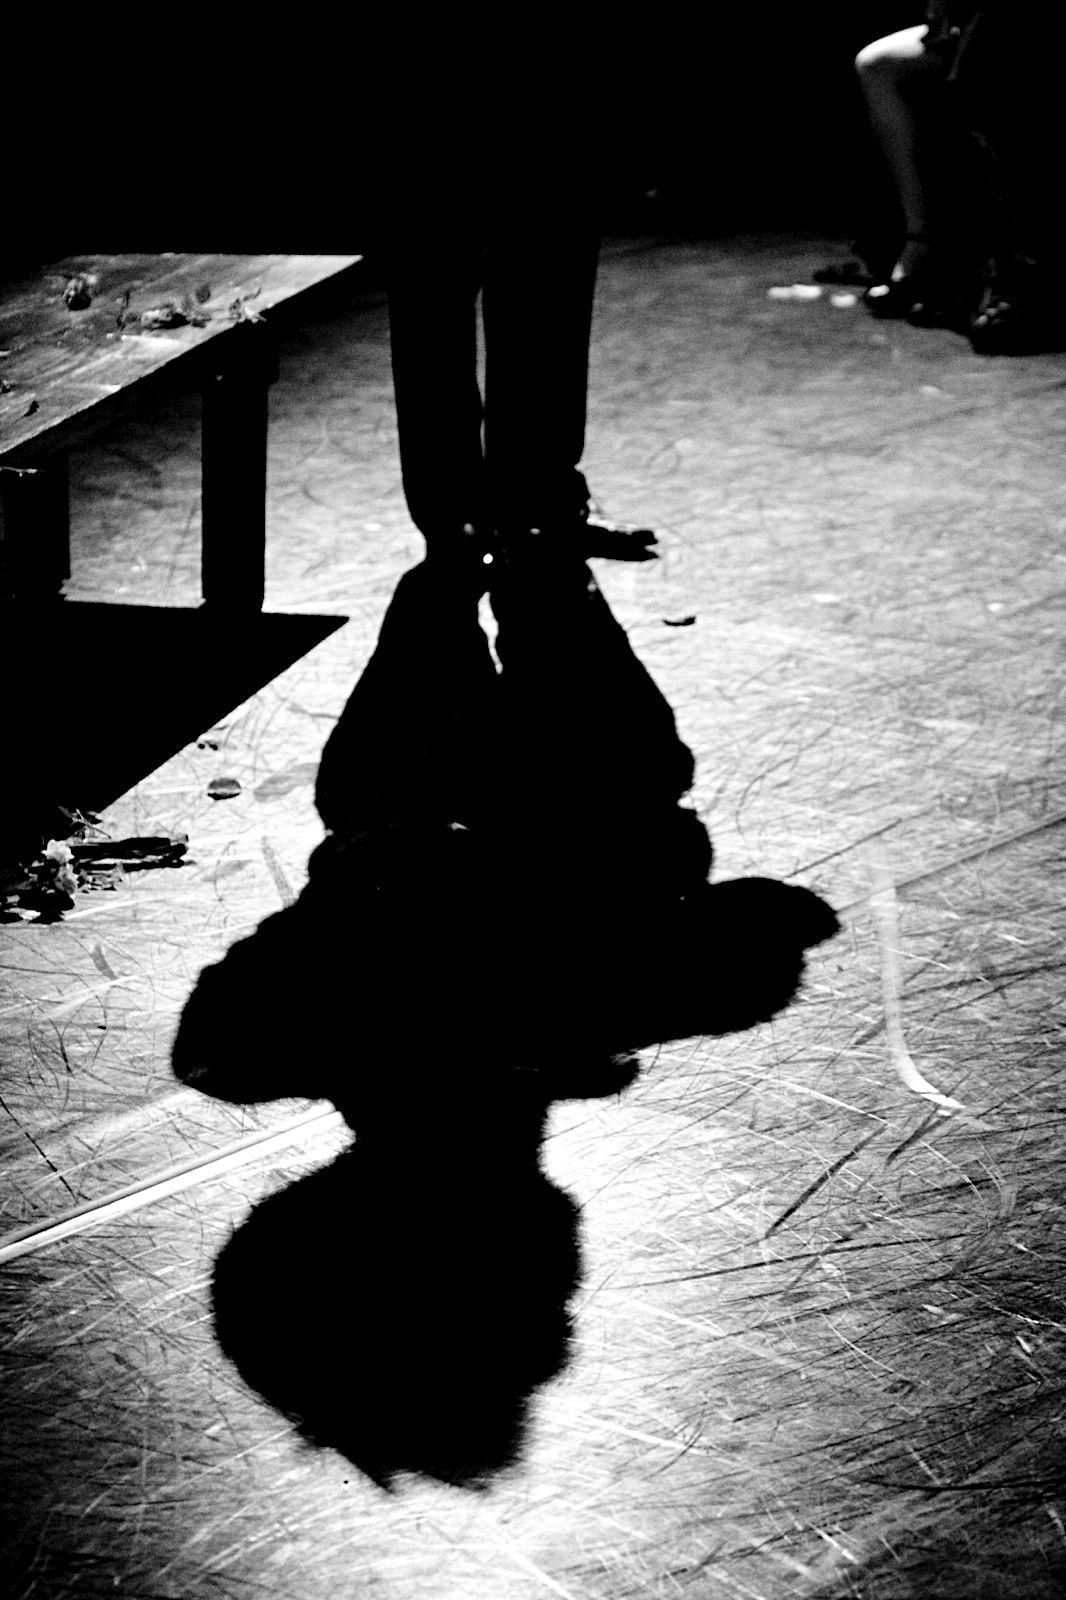 The 10th Muse. Misha Penton, soprano, concept, director. Alison Greene, Michael Walsh, Shelley Auer, Dennis Arrowsmith, Jill Alexander Essbaum, Kade Smith, with Stephen Jones, piano, et al. Photos: E. Melear.